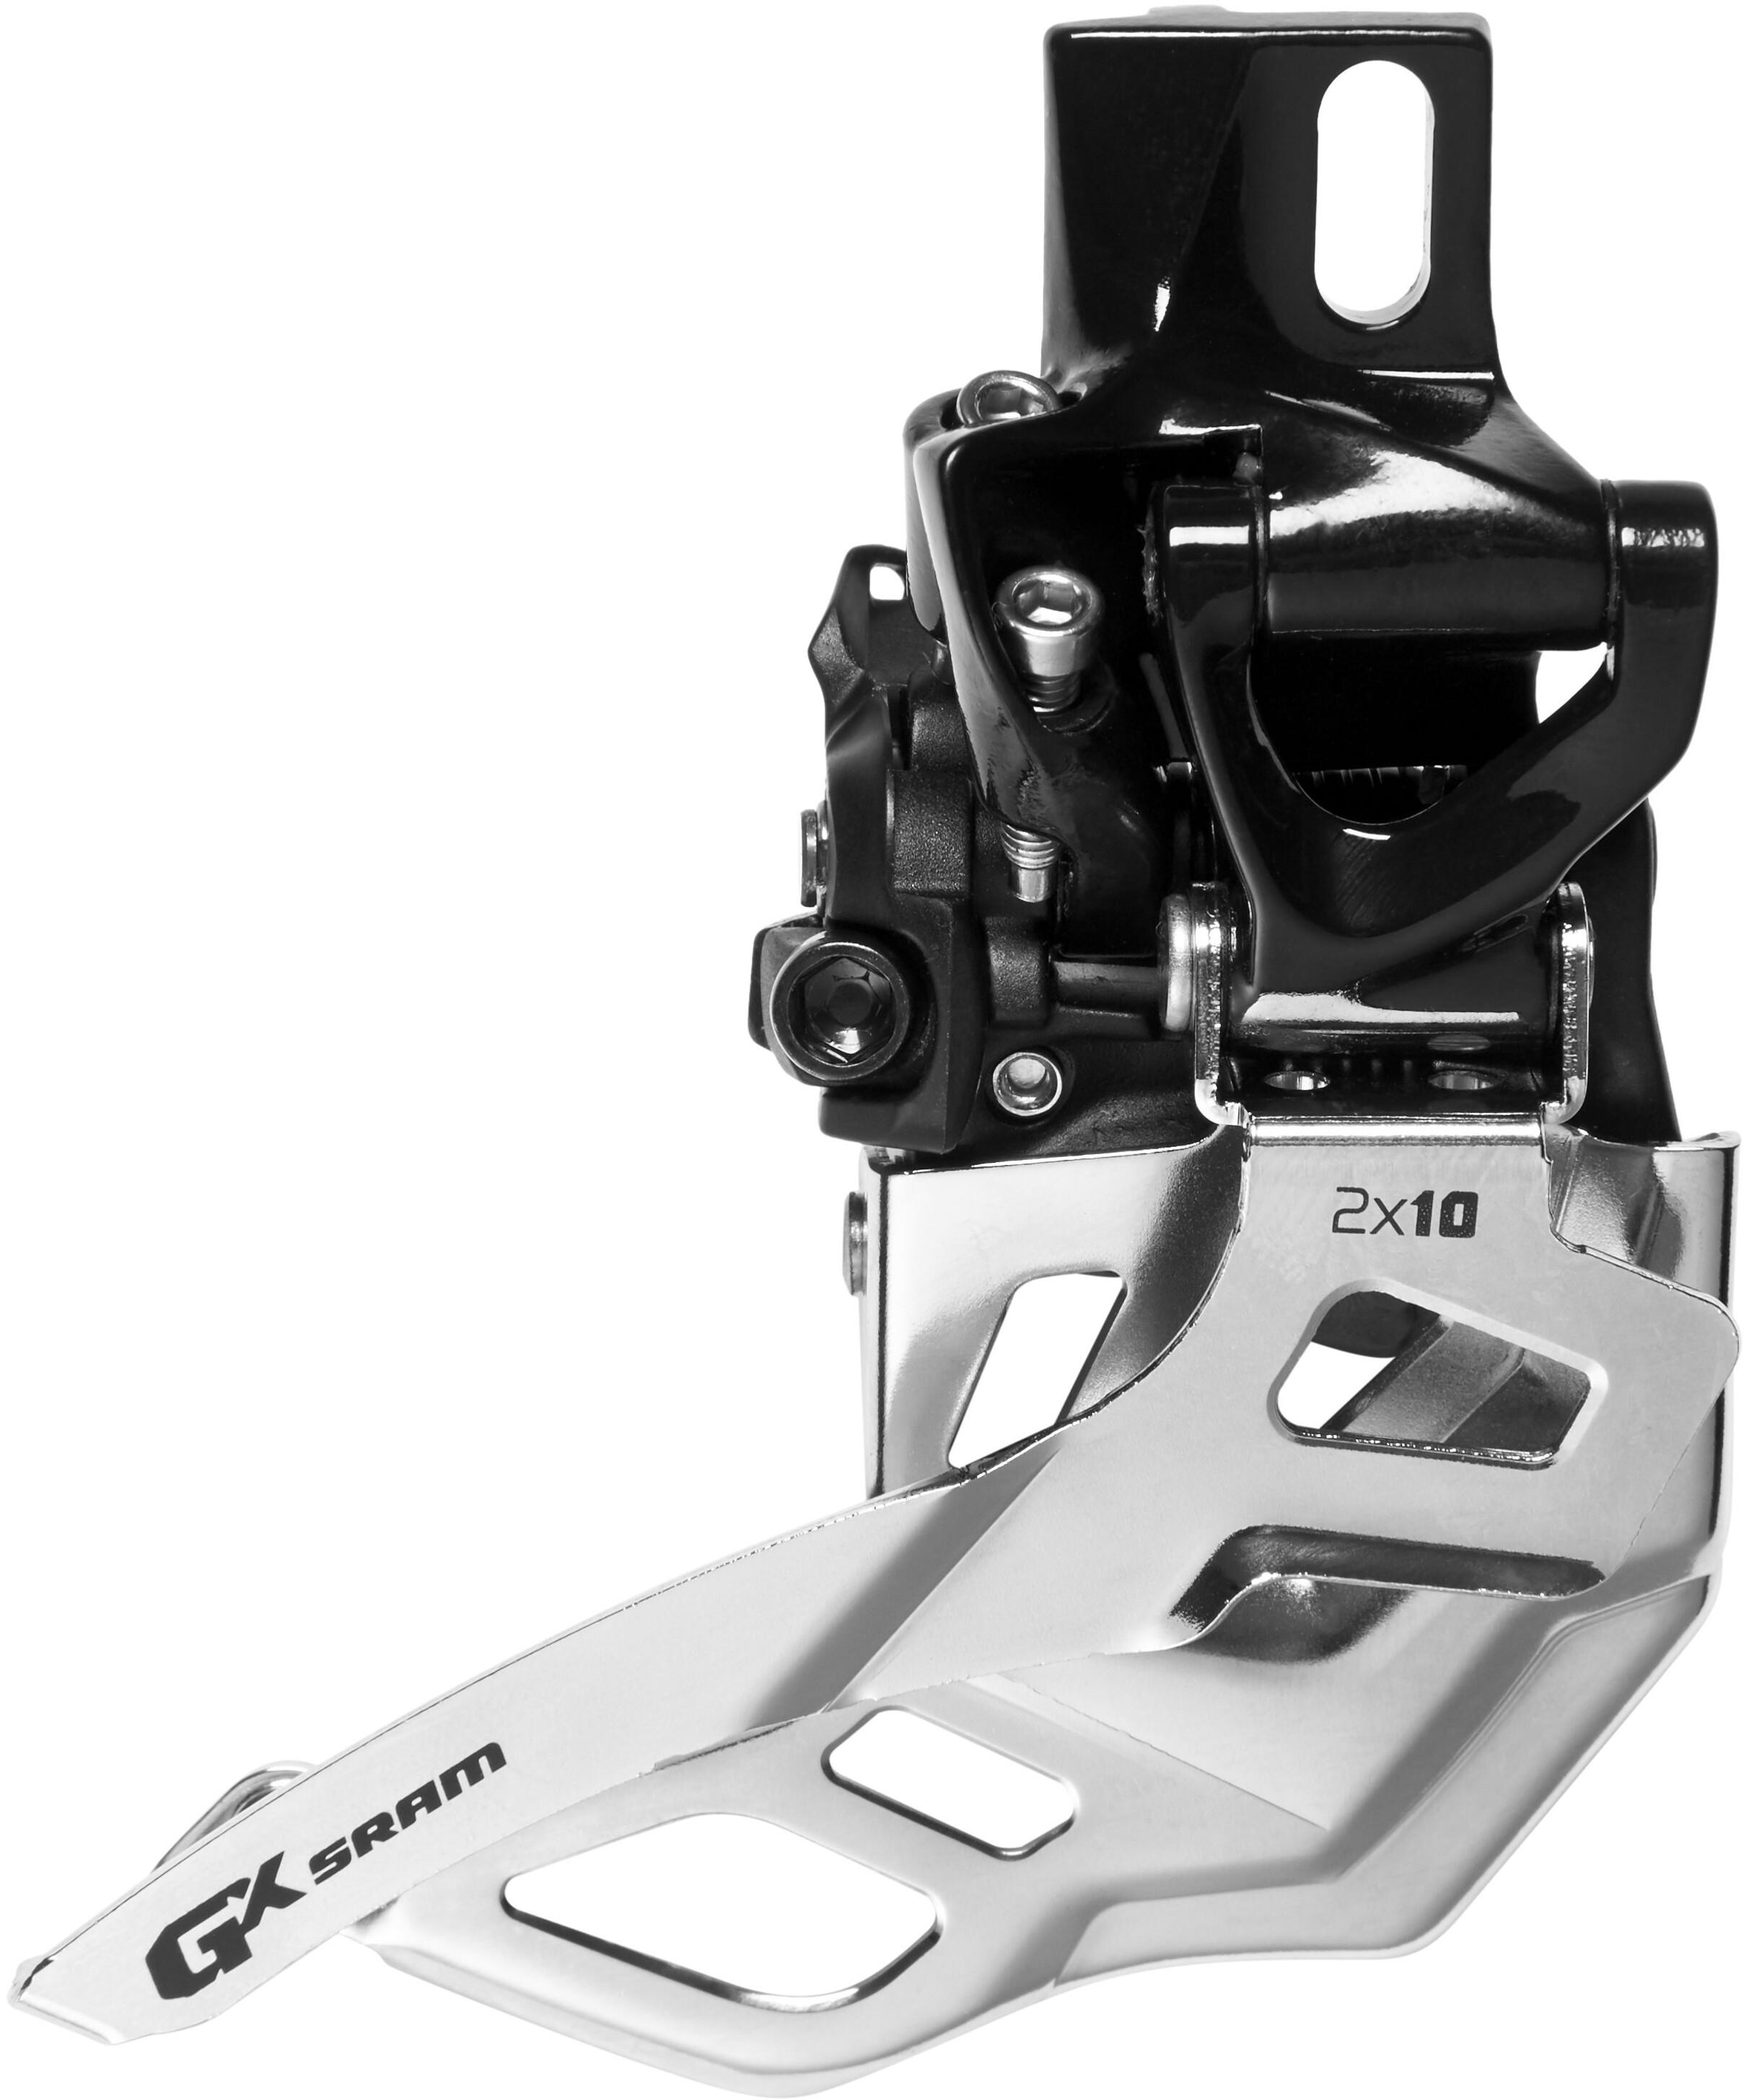 SRAM GX Umwerfer 2x10-fach High Direct Mount Bottom Pull